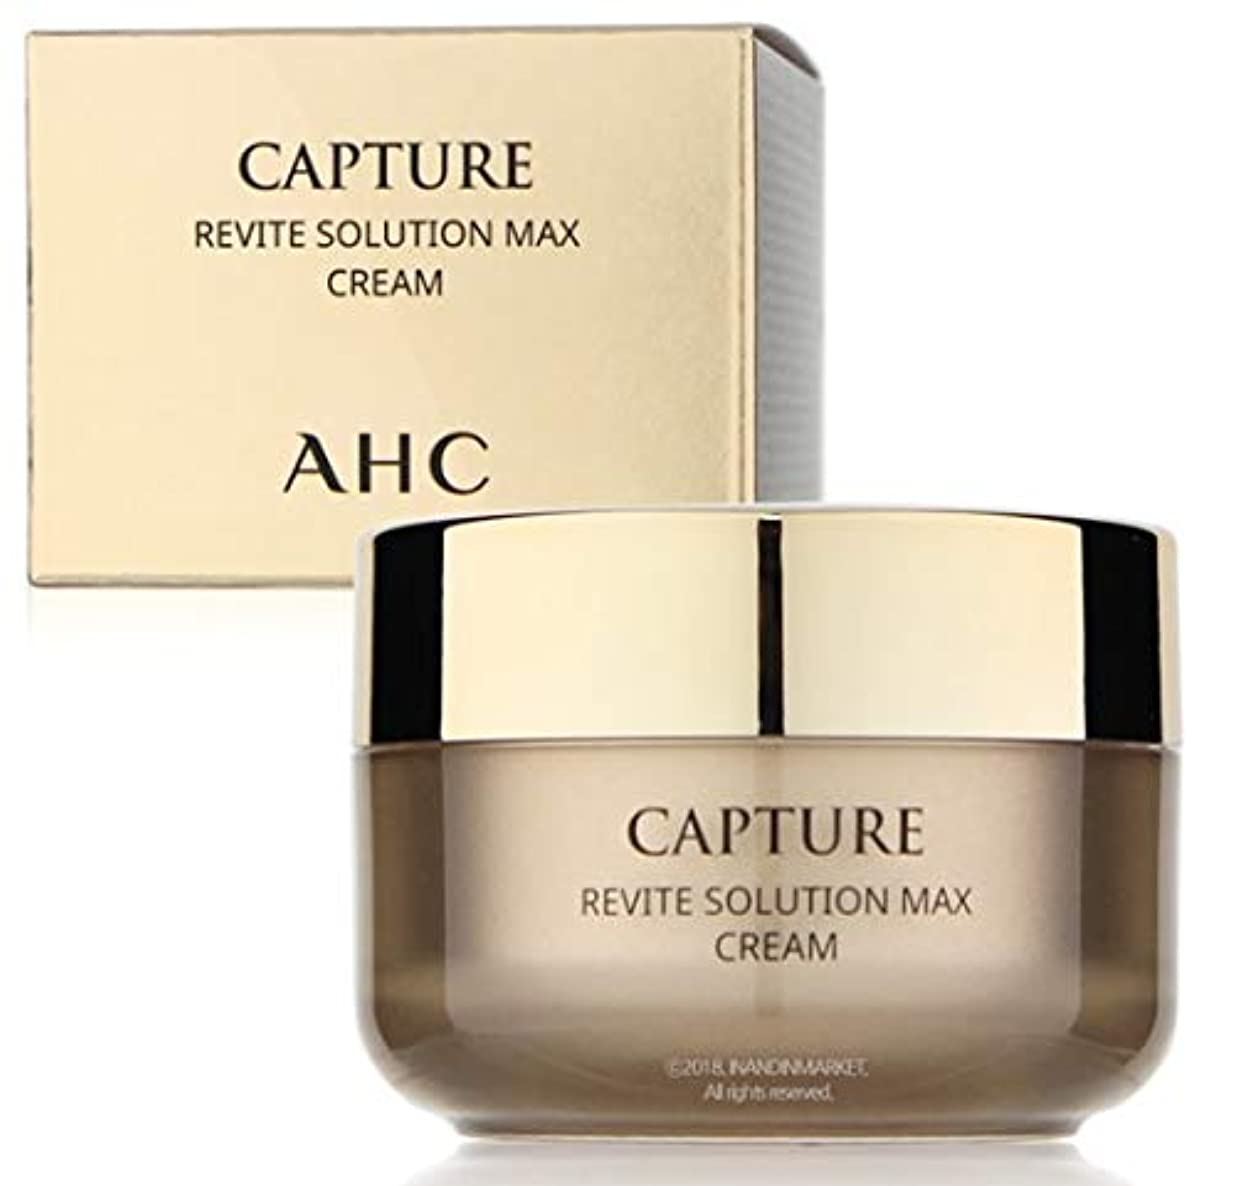 AHC Capture Revite Solution Max Cream/キャプチャー リバイト ソリューション マックス クリーム 50ml [並行輸入品]